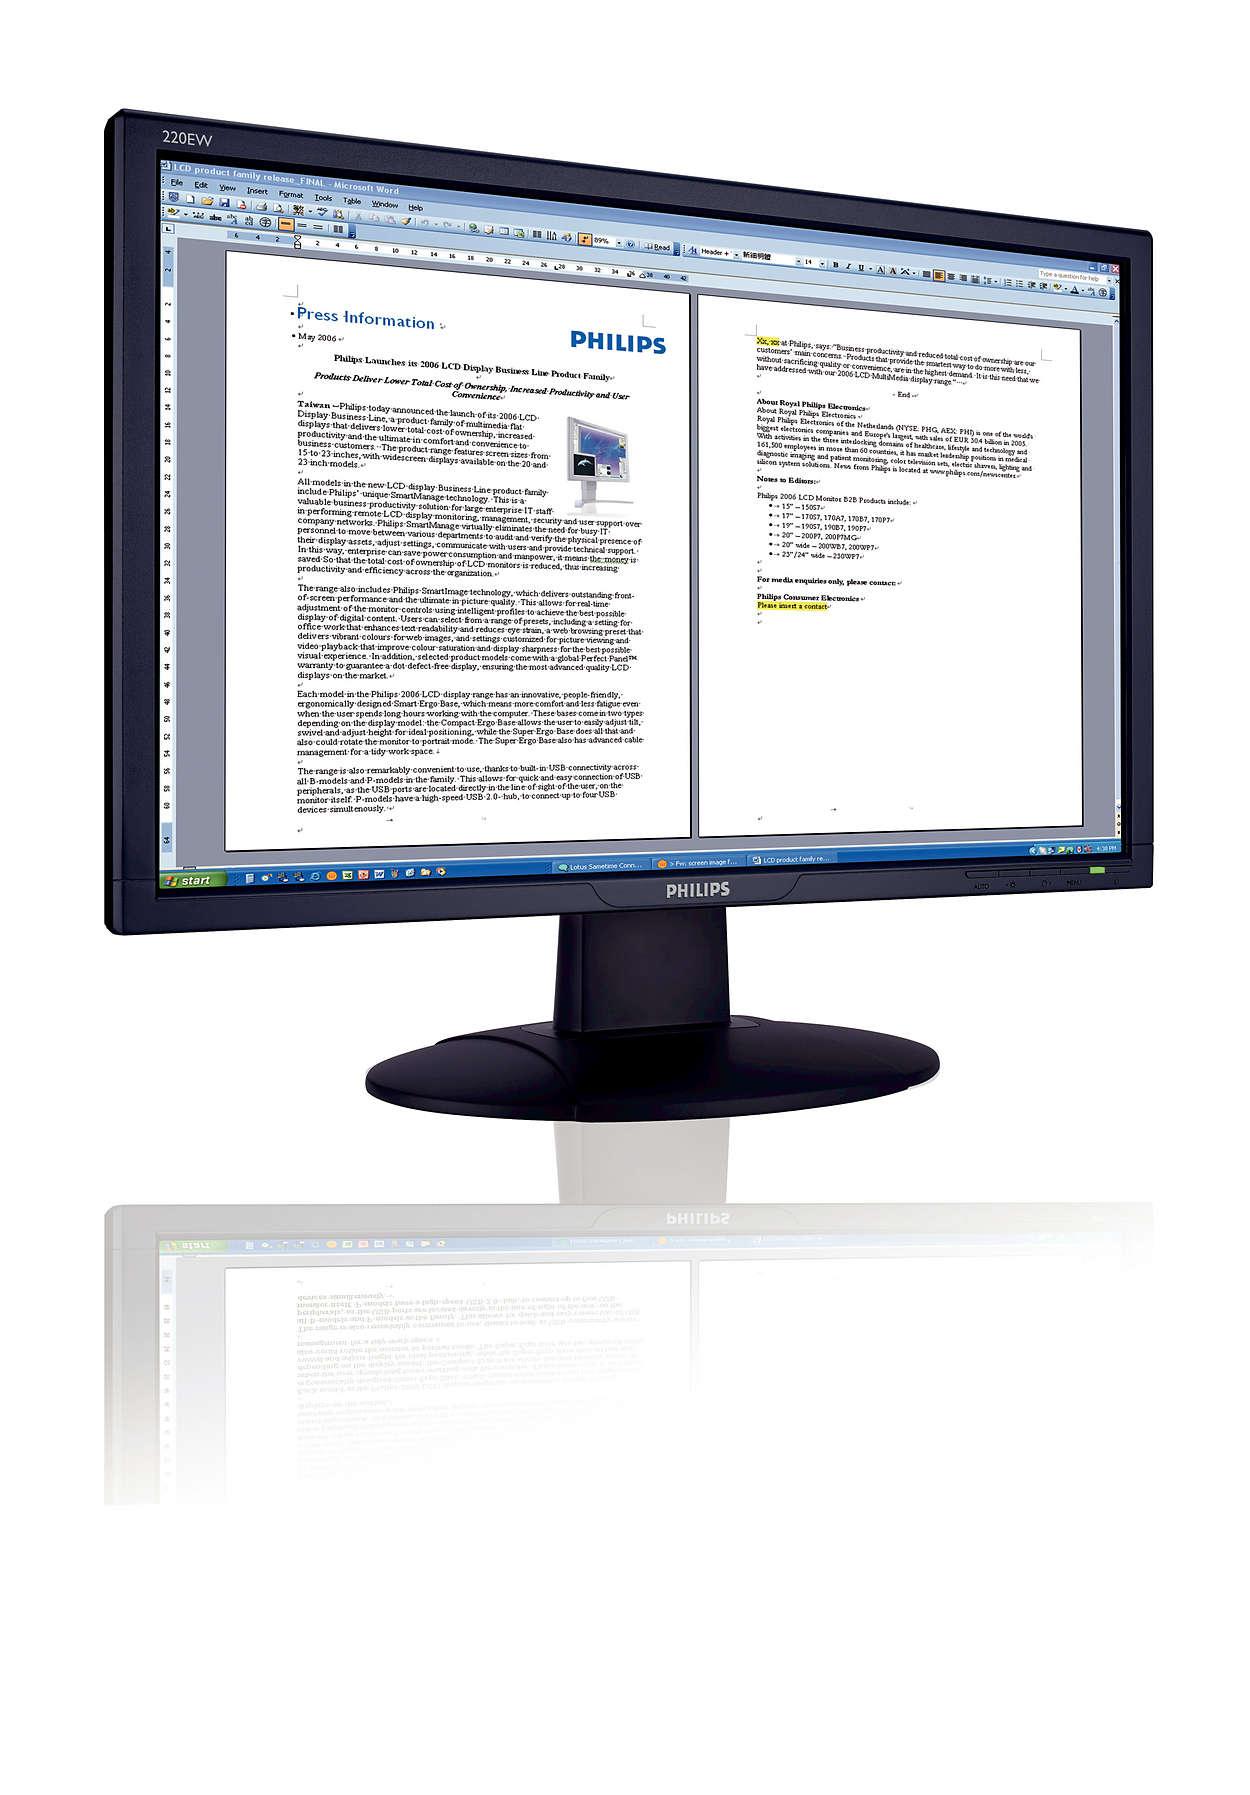 Ideell widescreen med best kostnadsytelsesverdi